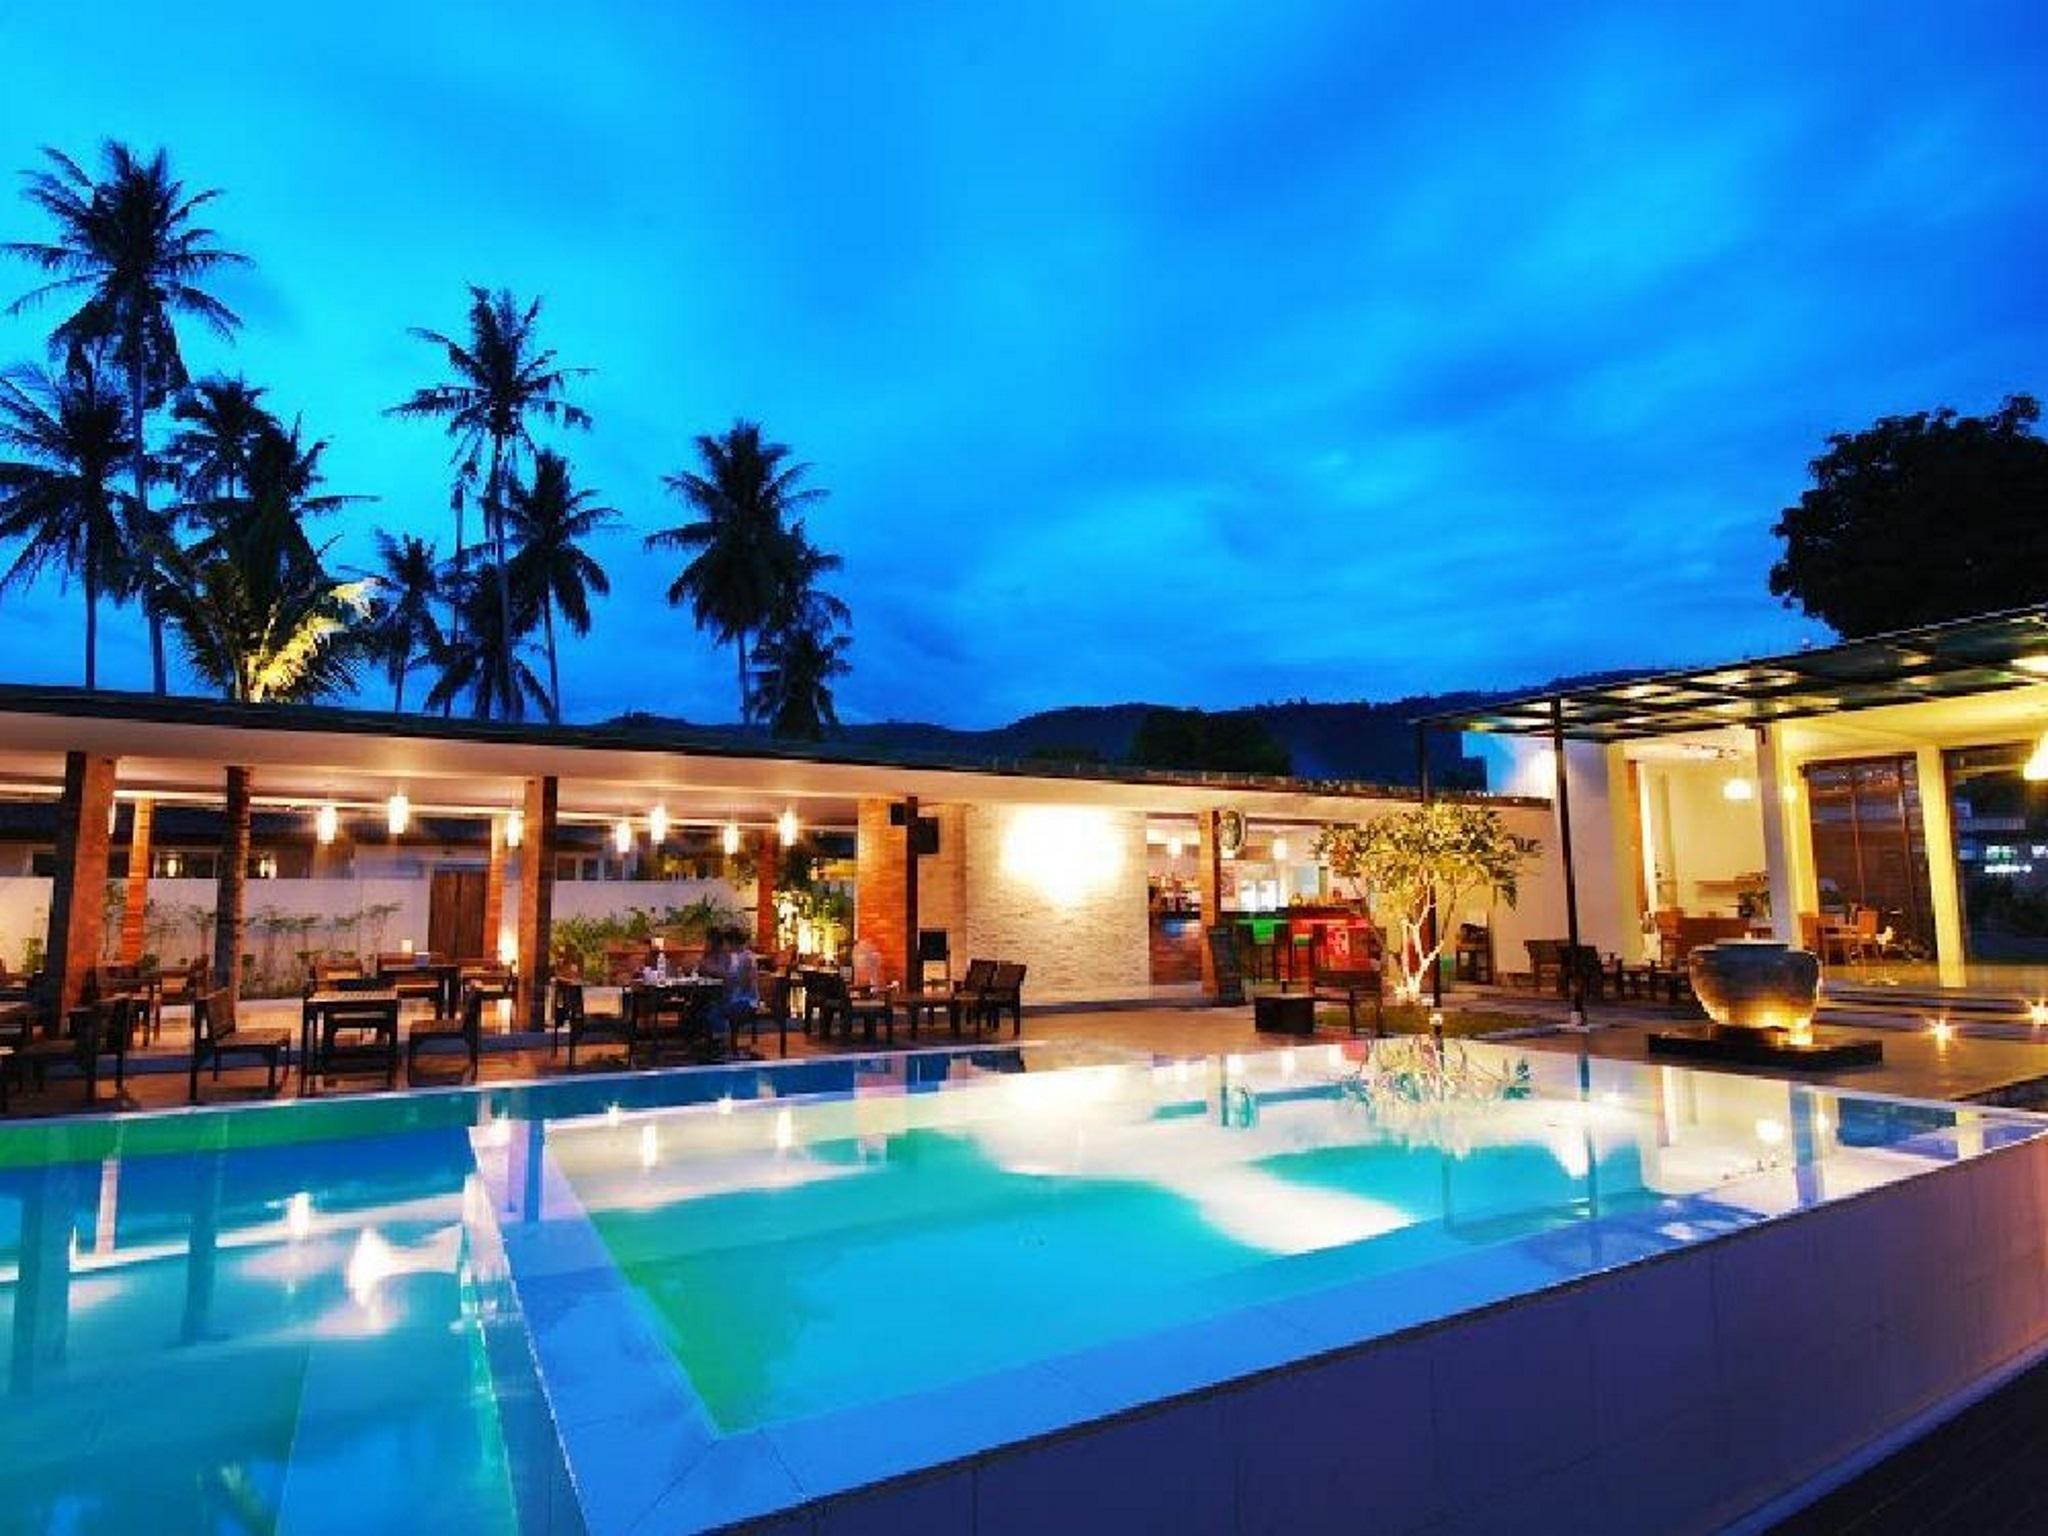 The Living Pool Villas เดอะ ลิฟวิ่ง พูล วิลลาส์